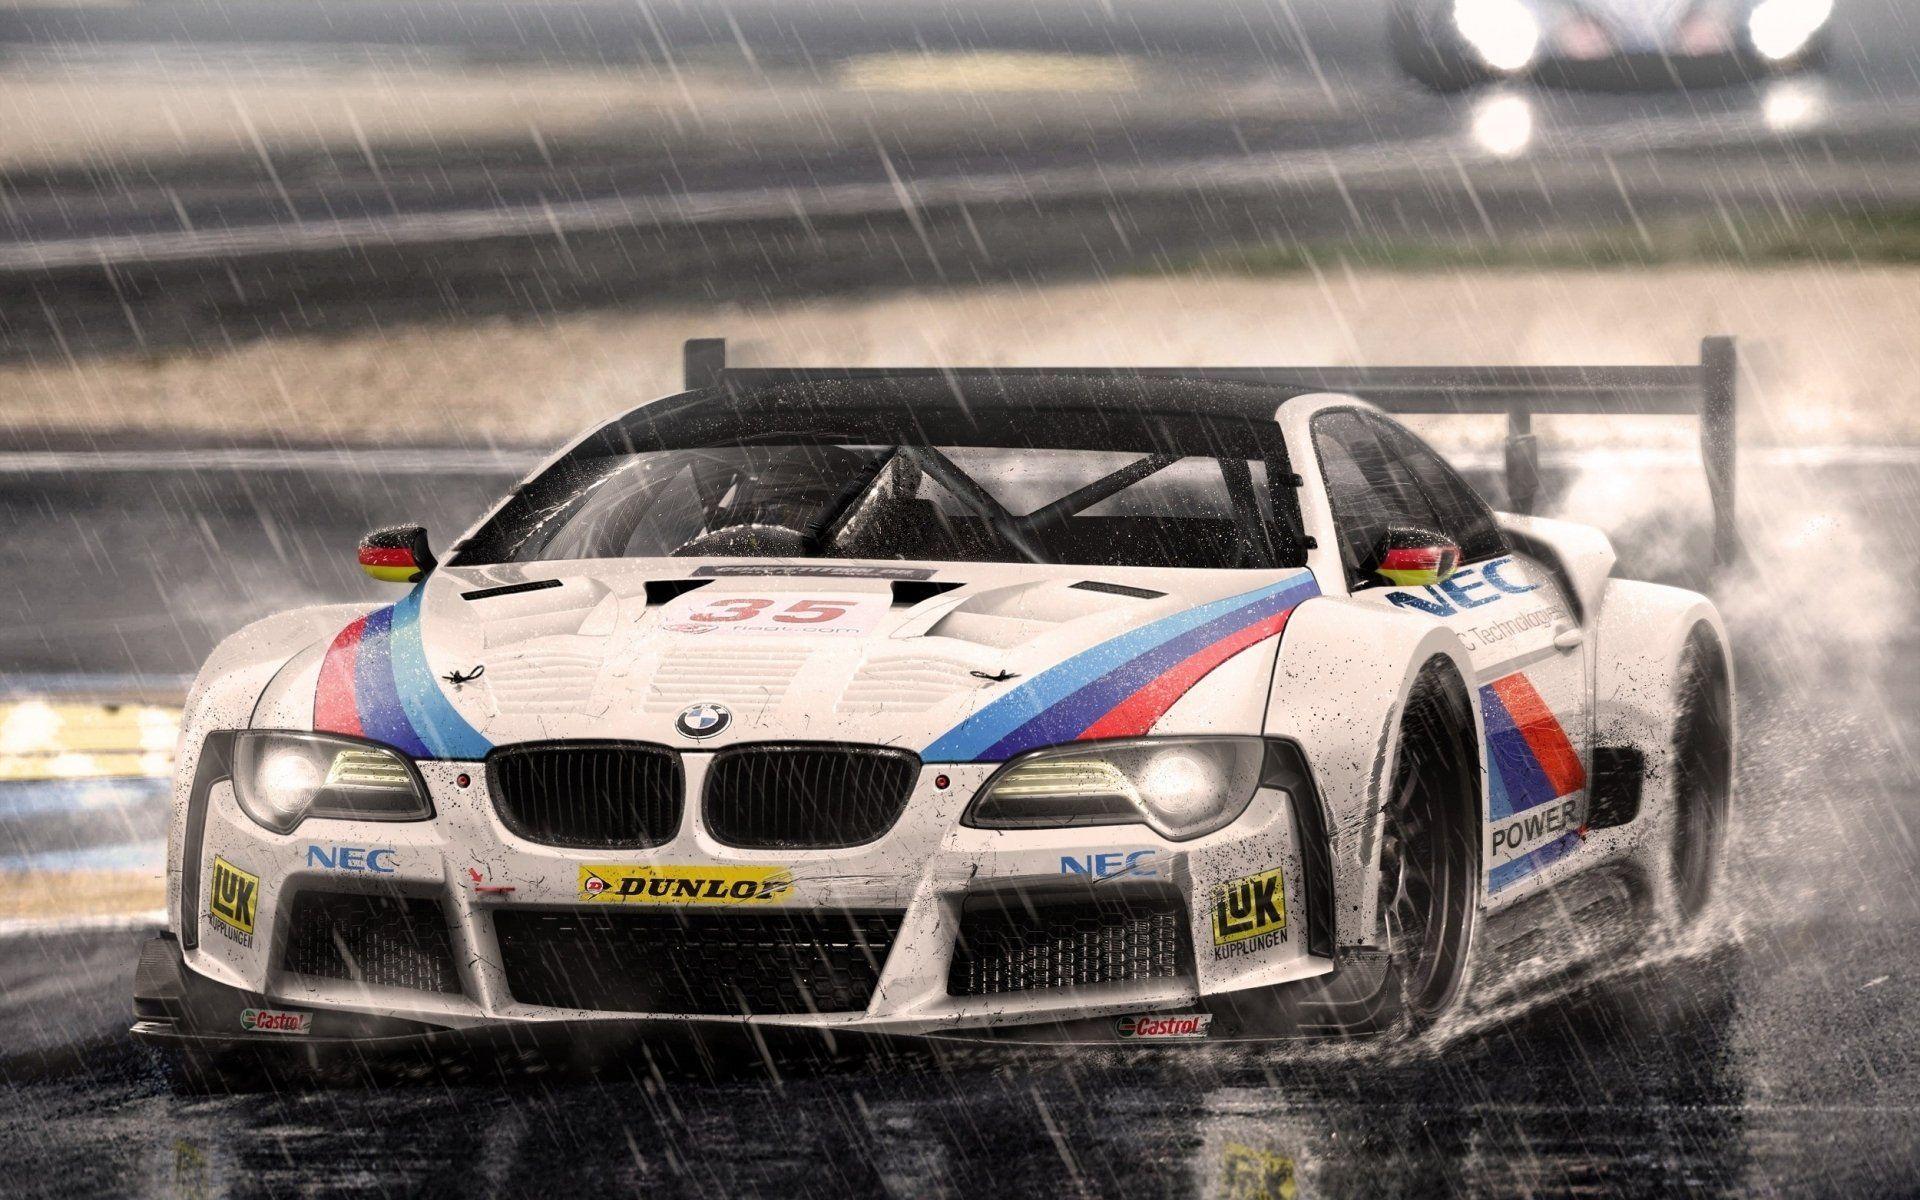 Race Car Wallpapers Top Free Race Car Backgrounds Wallpaperaccess